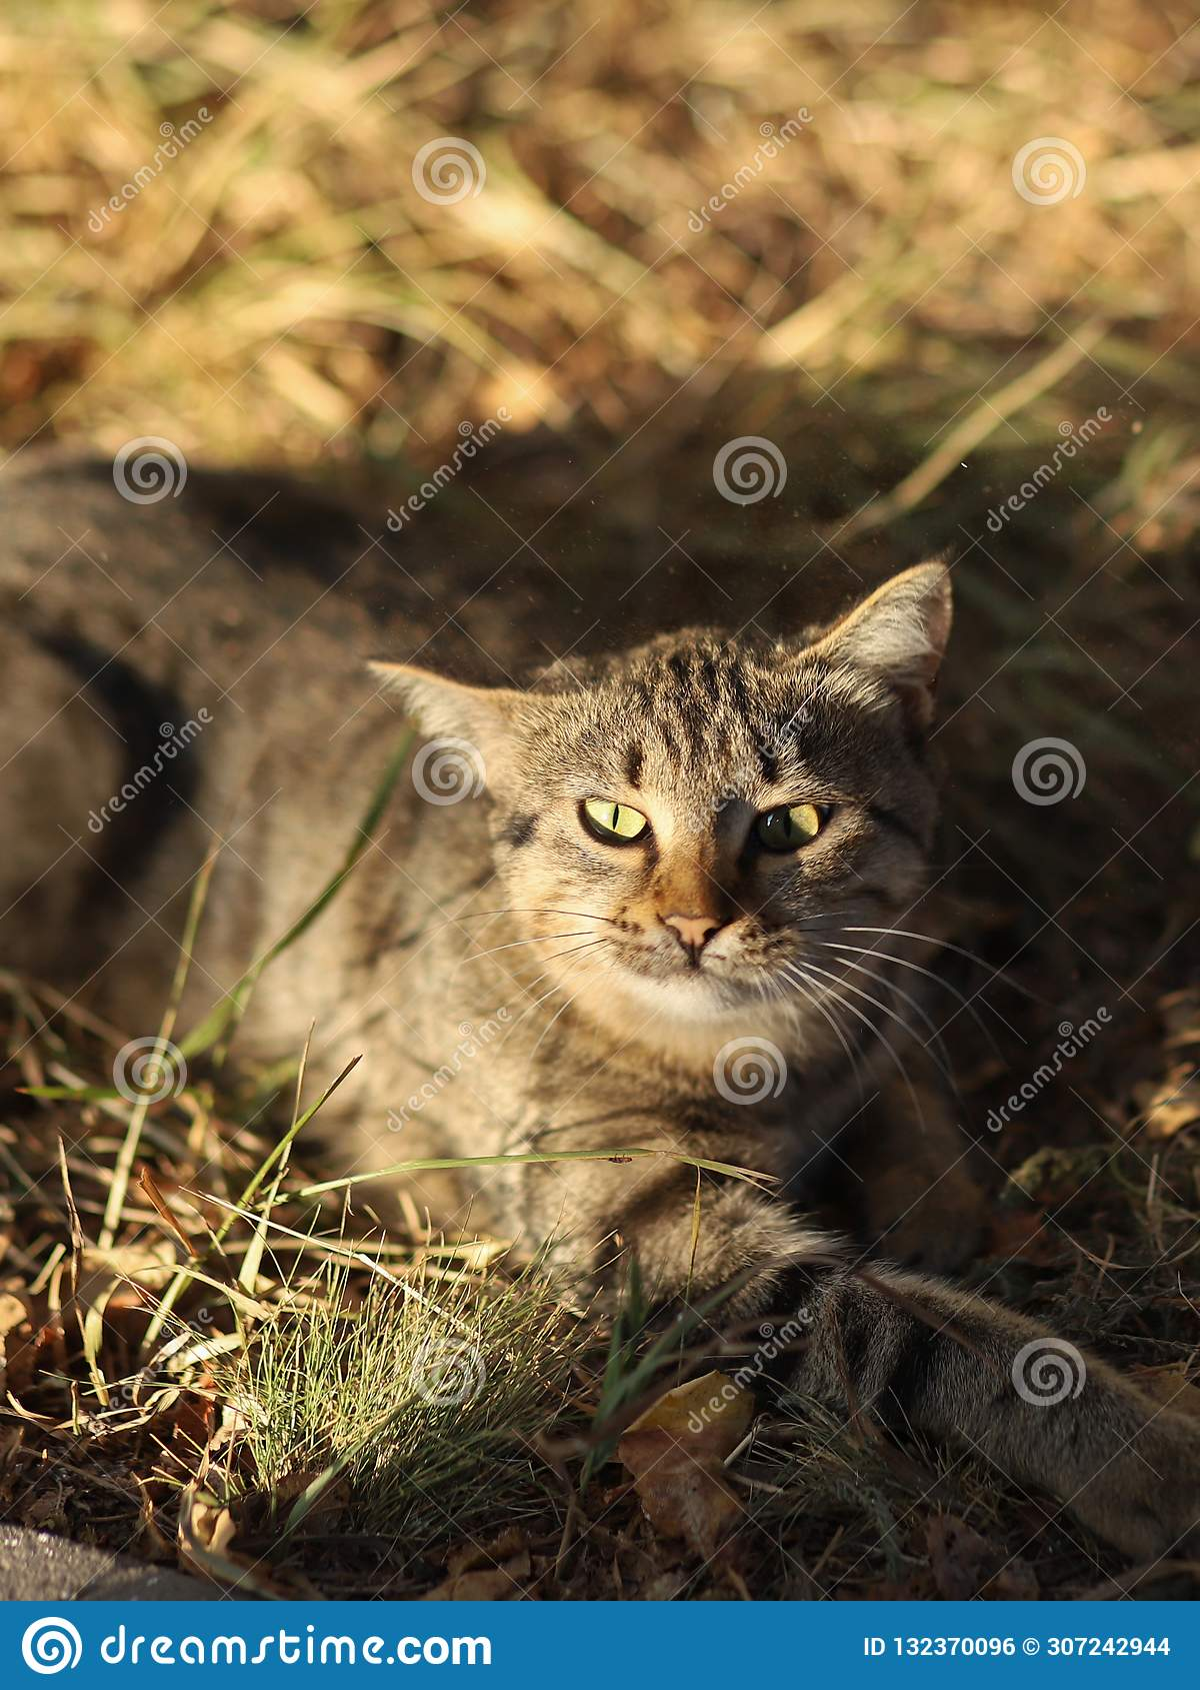 La nueva foto perdida de Cat Photographer, pequeño gato de tigre se relaja